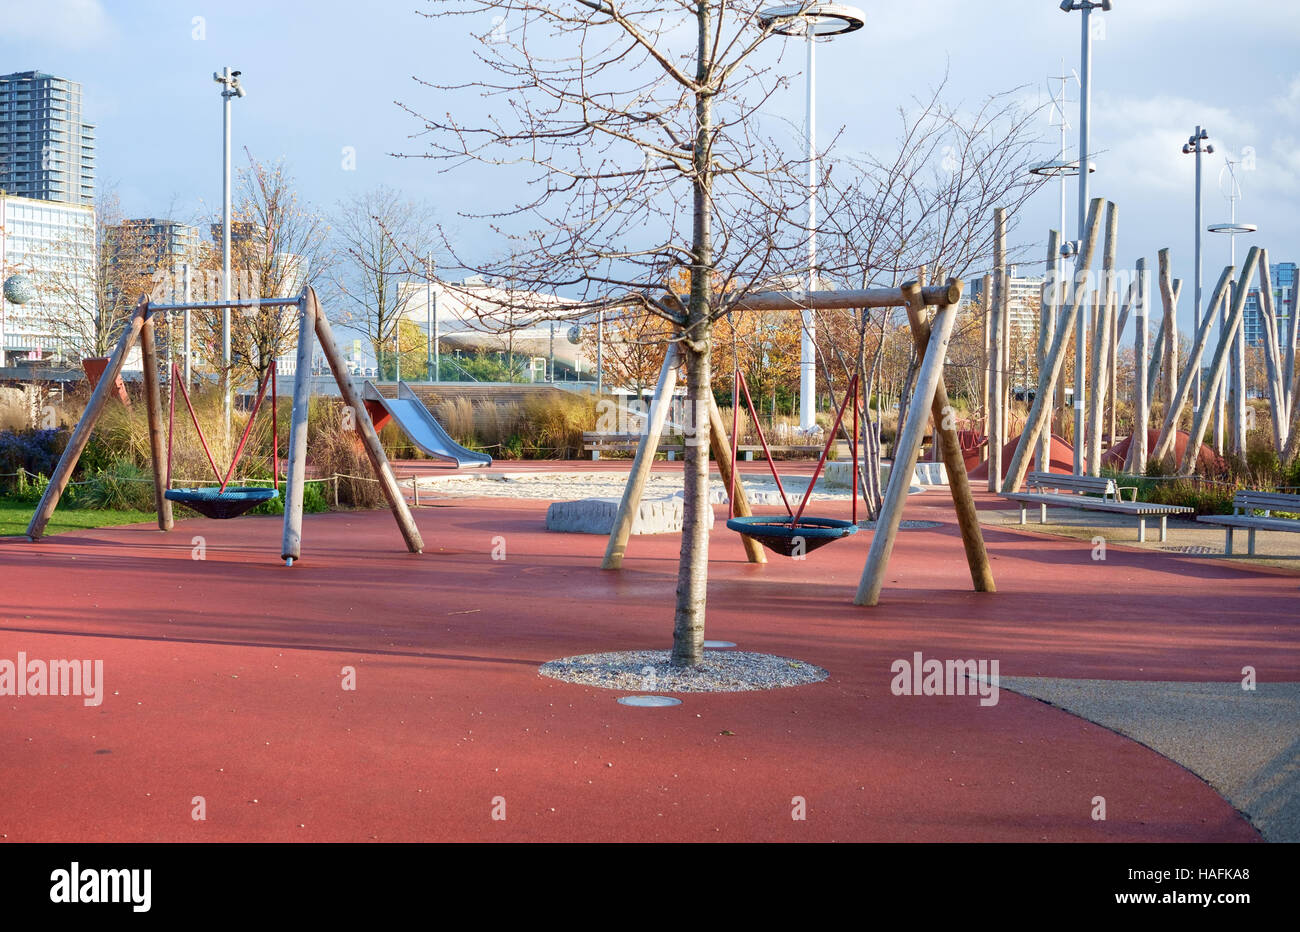 Empty Childrens Playground In Winter Queen Elizabeth Olympic Park Stratford London UK